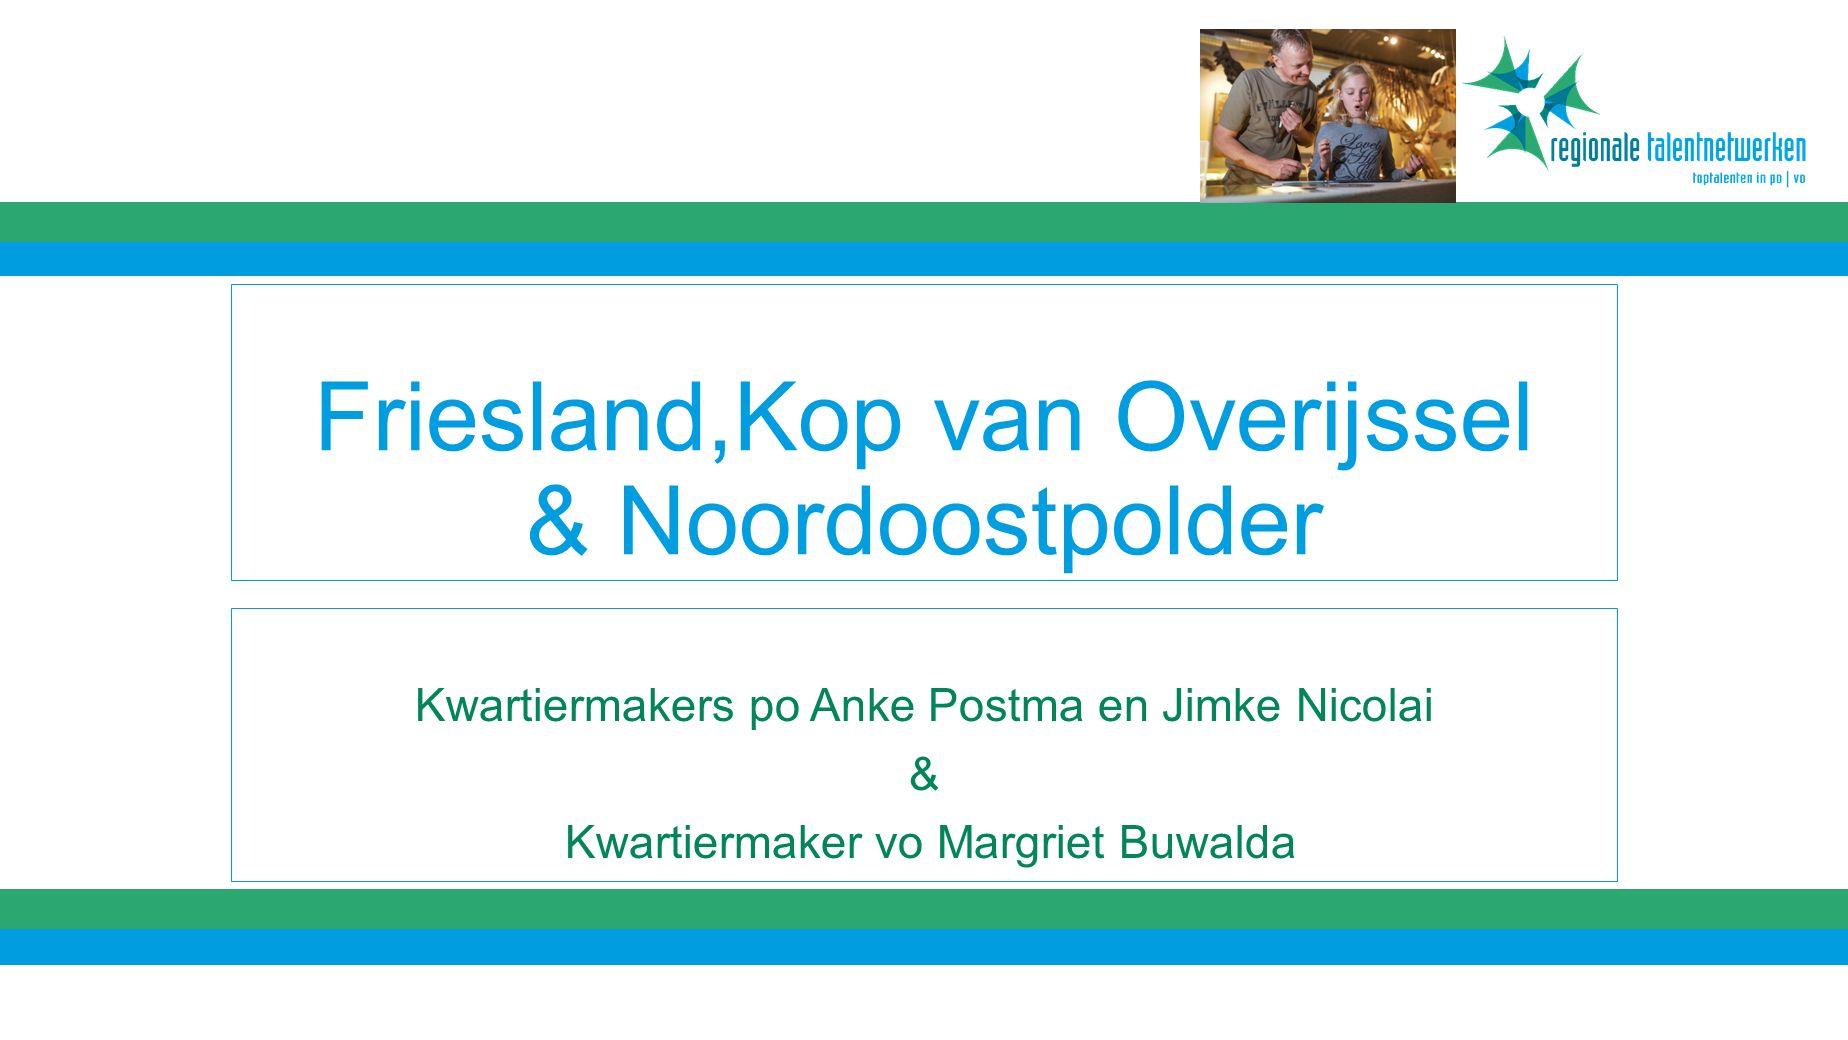 Friesland,Kop van Overijssel & Noordoostpolder Kwartiermakers po Anke Postma en Jimke Nicolai & Kwartiermaker vo Margriet Buwalda